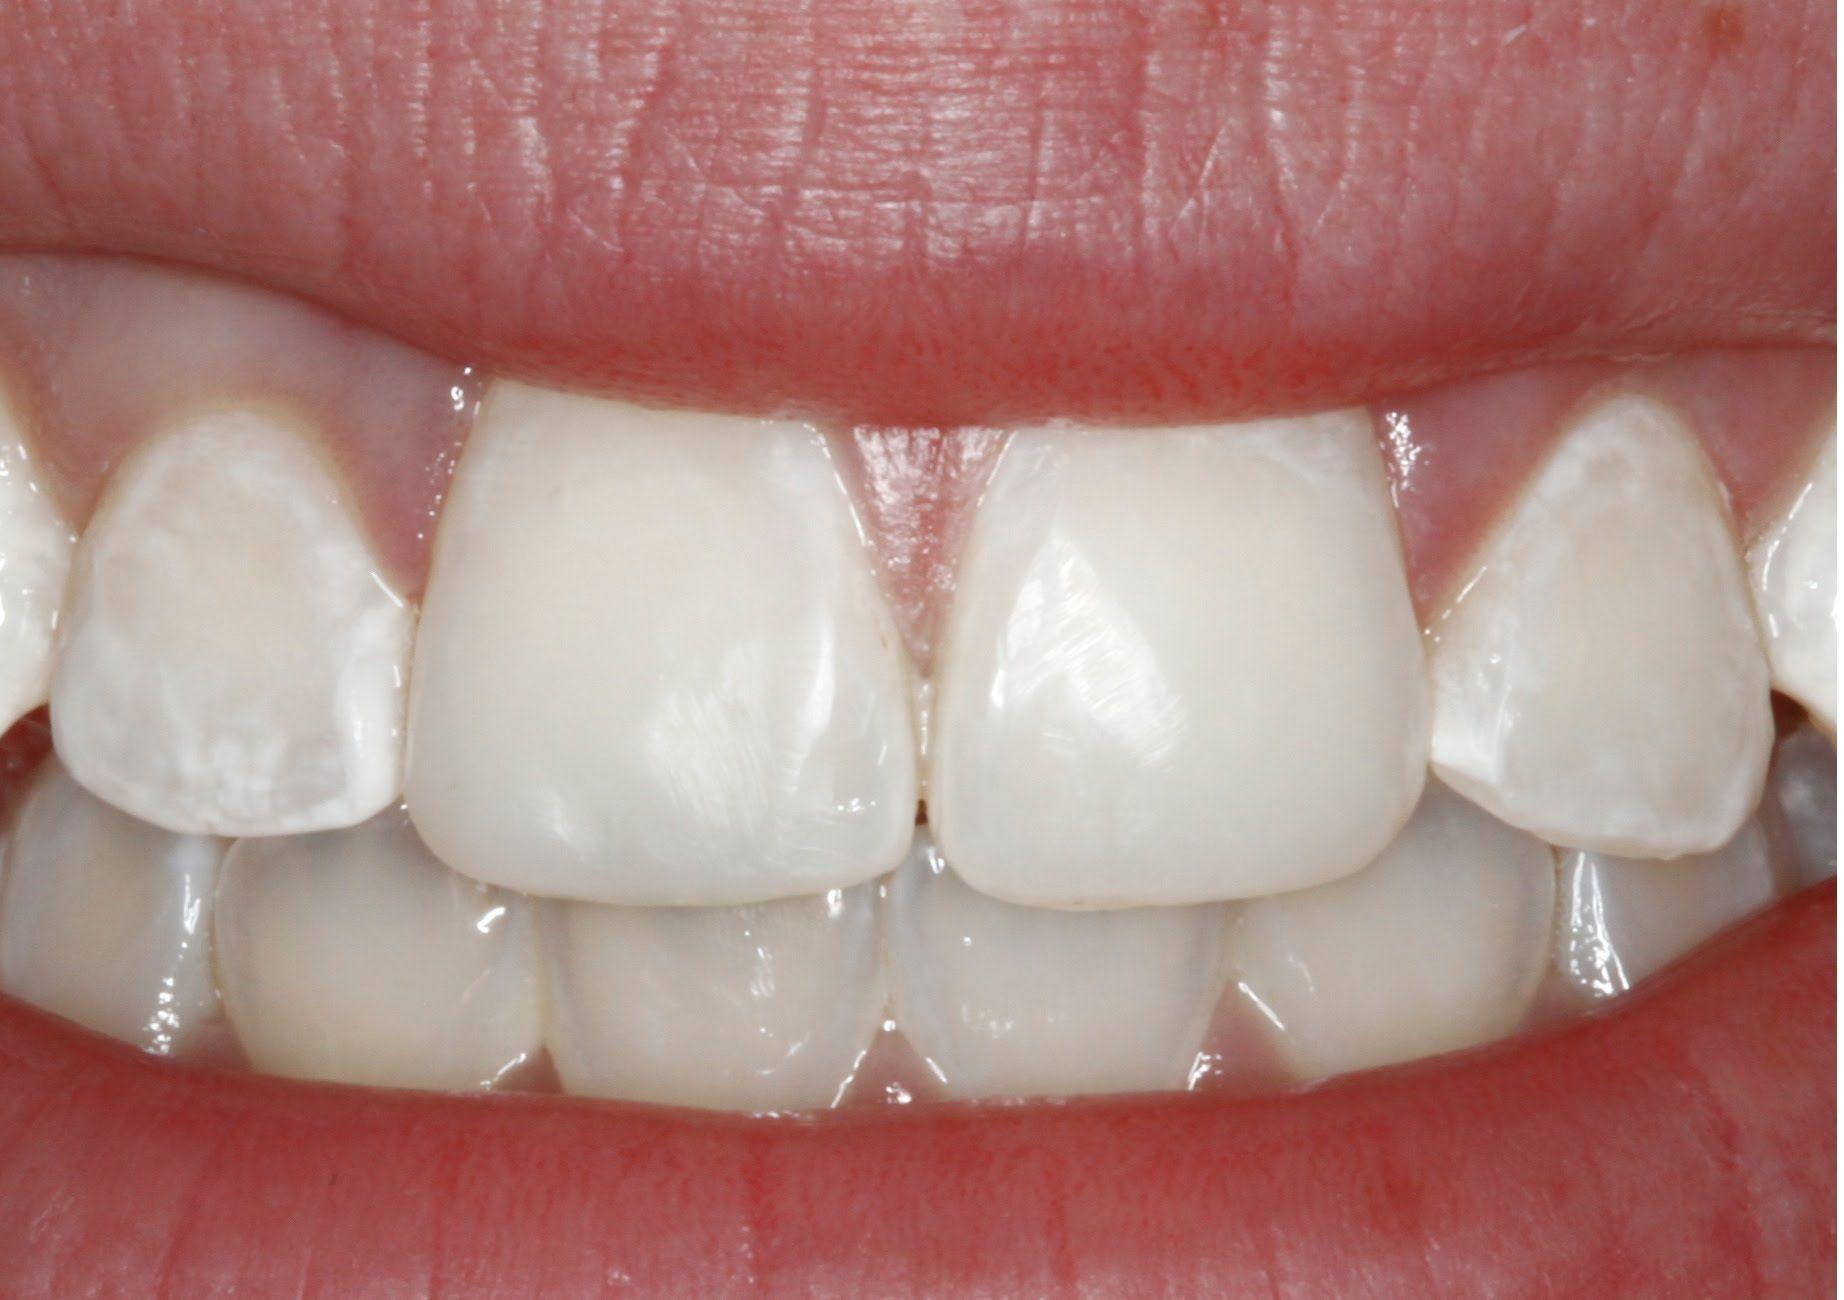 Colgate teeth whitening teeth whitening products pinterest teeth - Explore Natural Teeth Whitening Wisdom Teeth And More